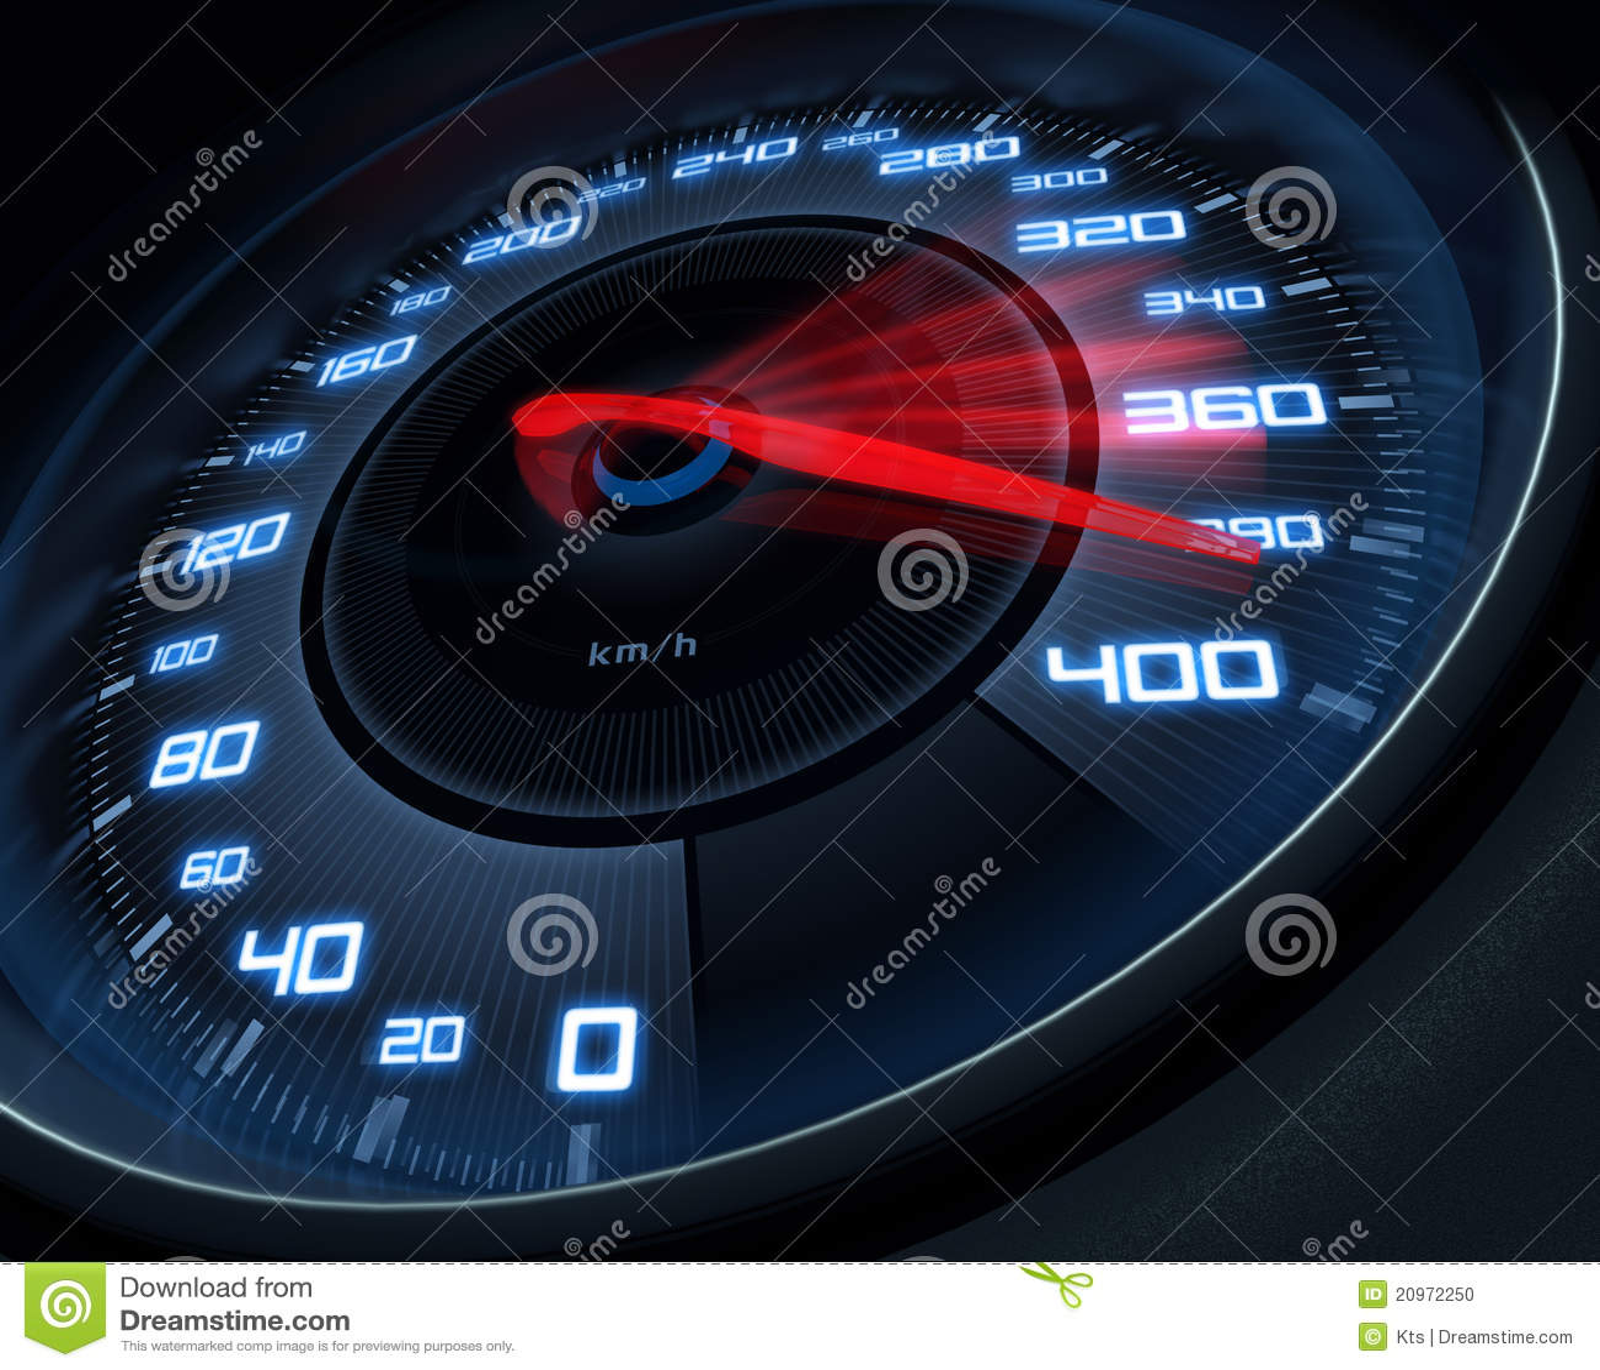 Blur 3d Wallpaper High Speed Stock Photo Image 20972250